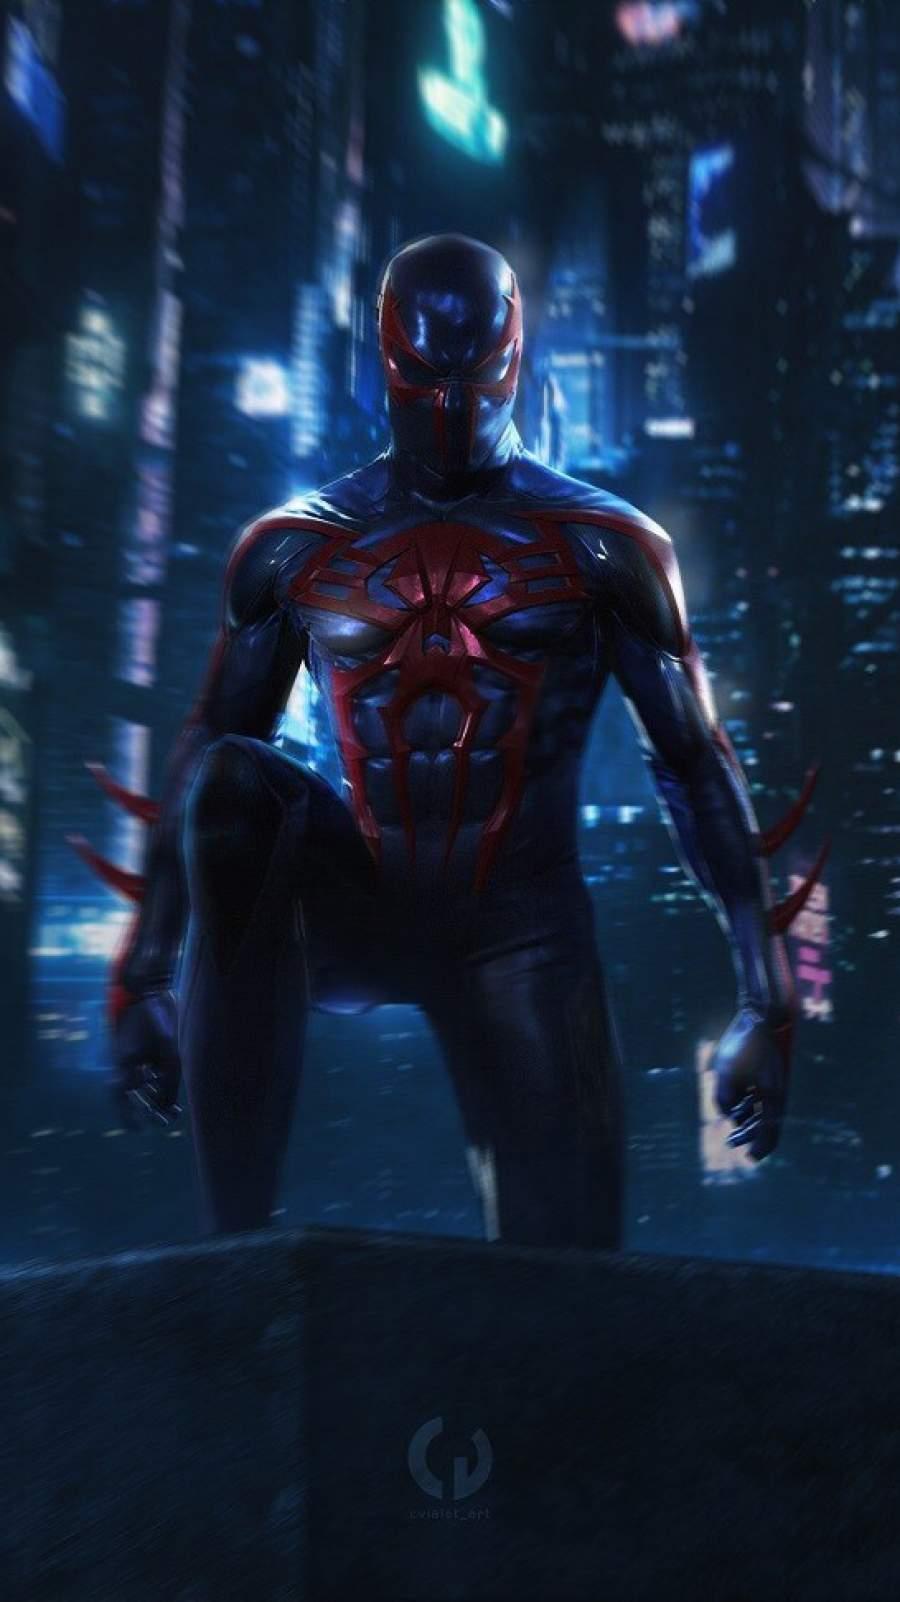 Spiderman Future iPhone Wallpaper